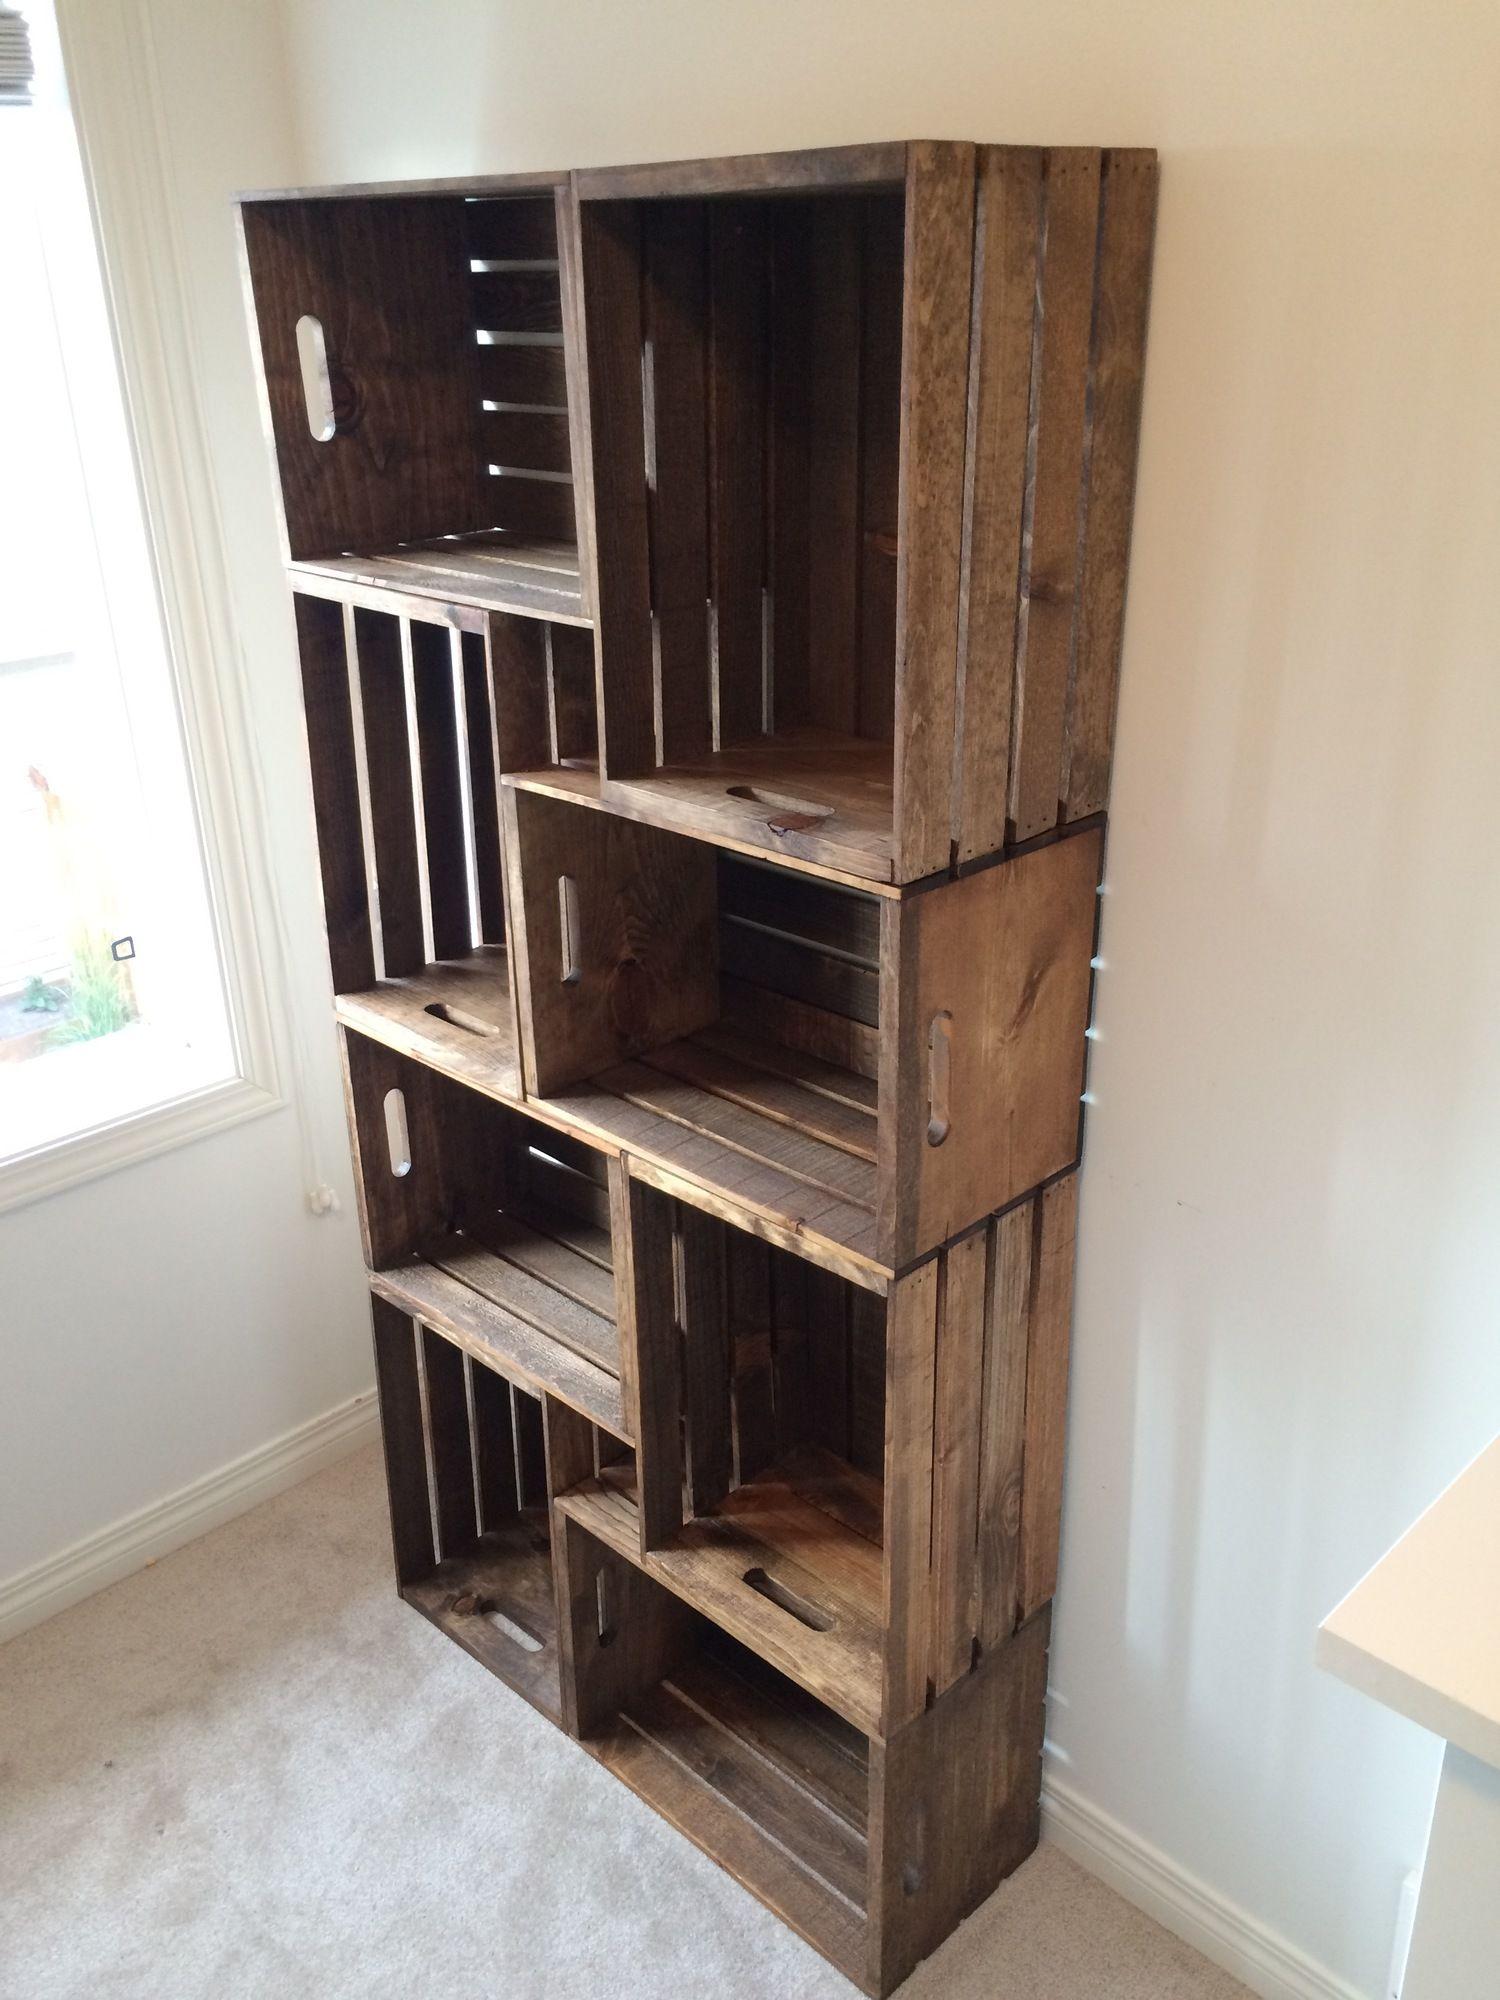 Diy Crate Bookshelf Tutorial Crate Bookshelf Craft Desk